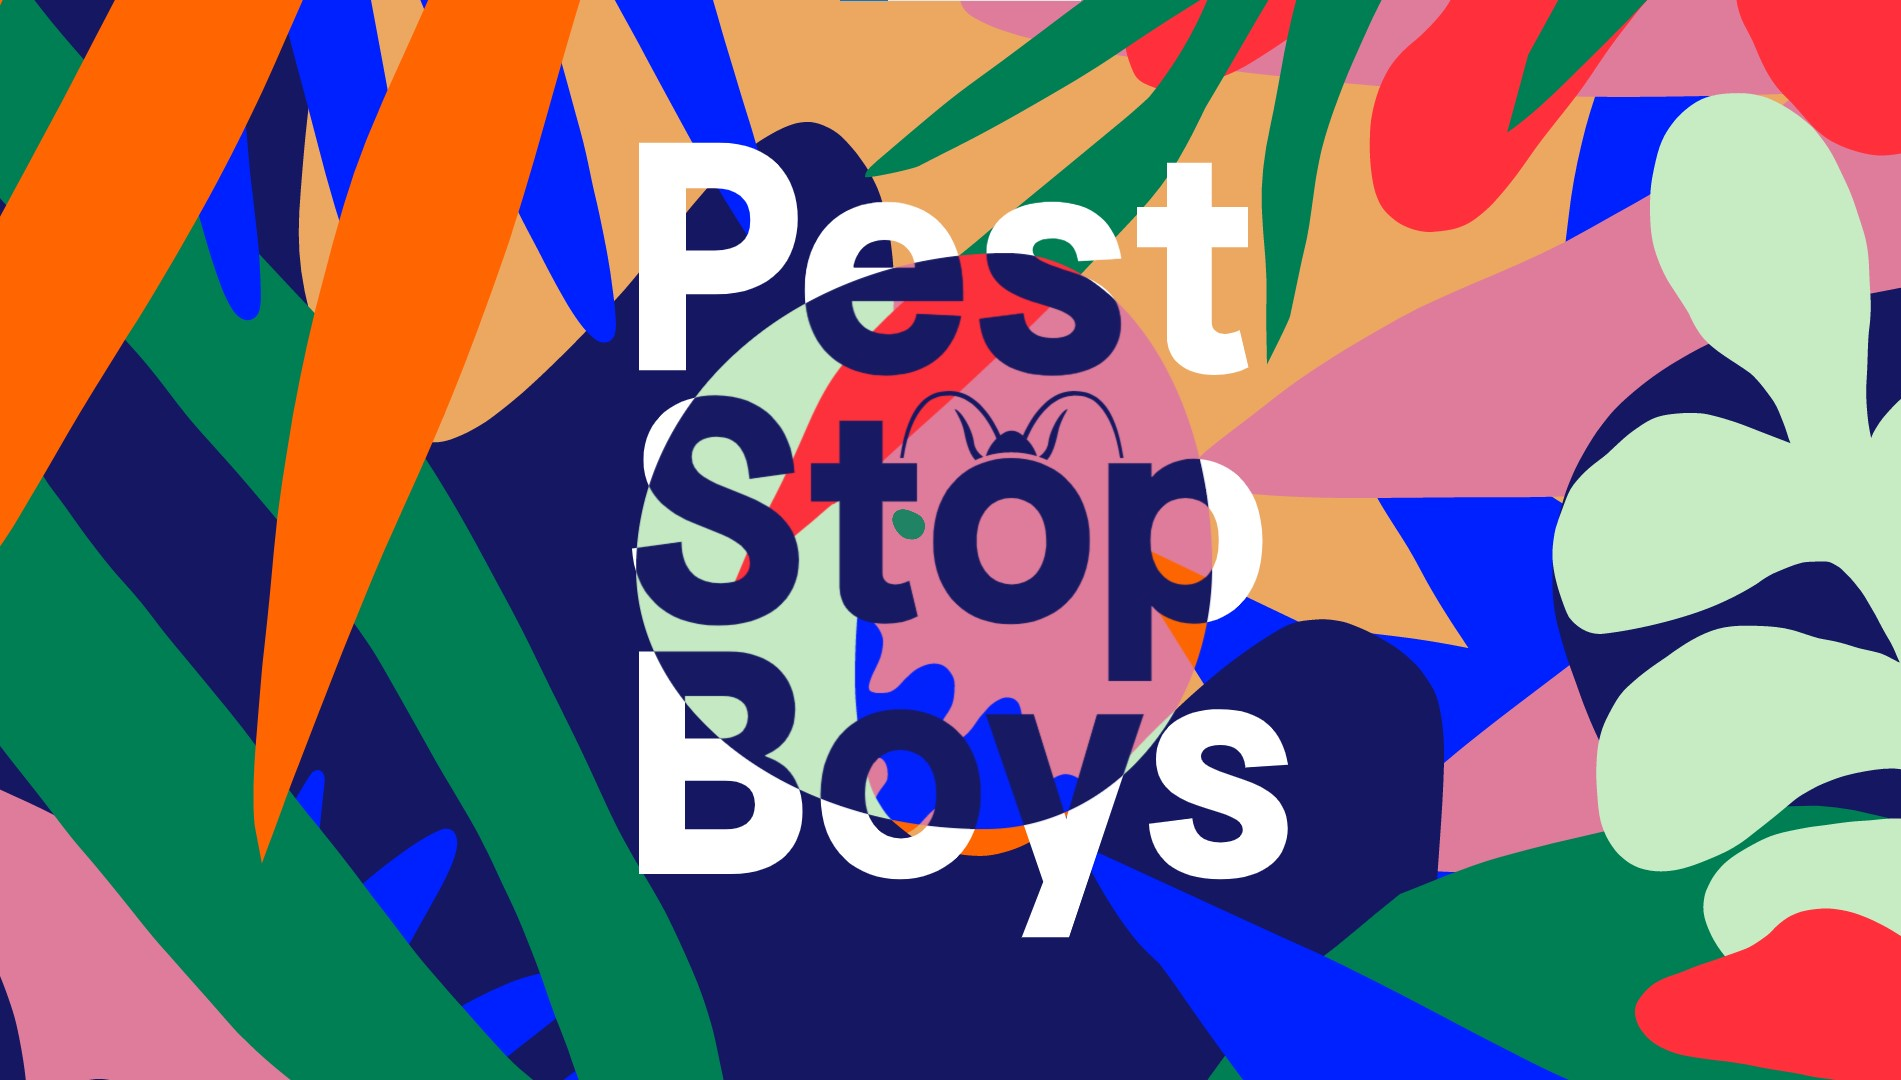 Orpetron Web Design Awards - Pest Stop Boys - Web Design Awards Inspiration Trends UI UX